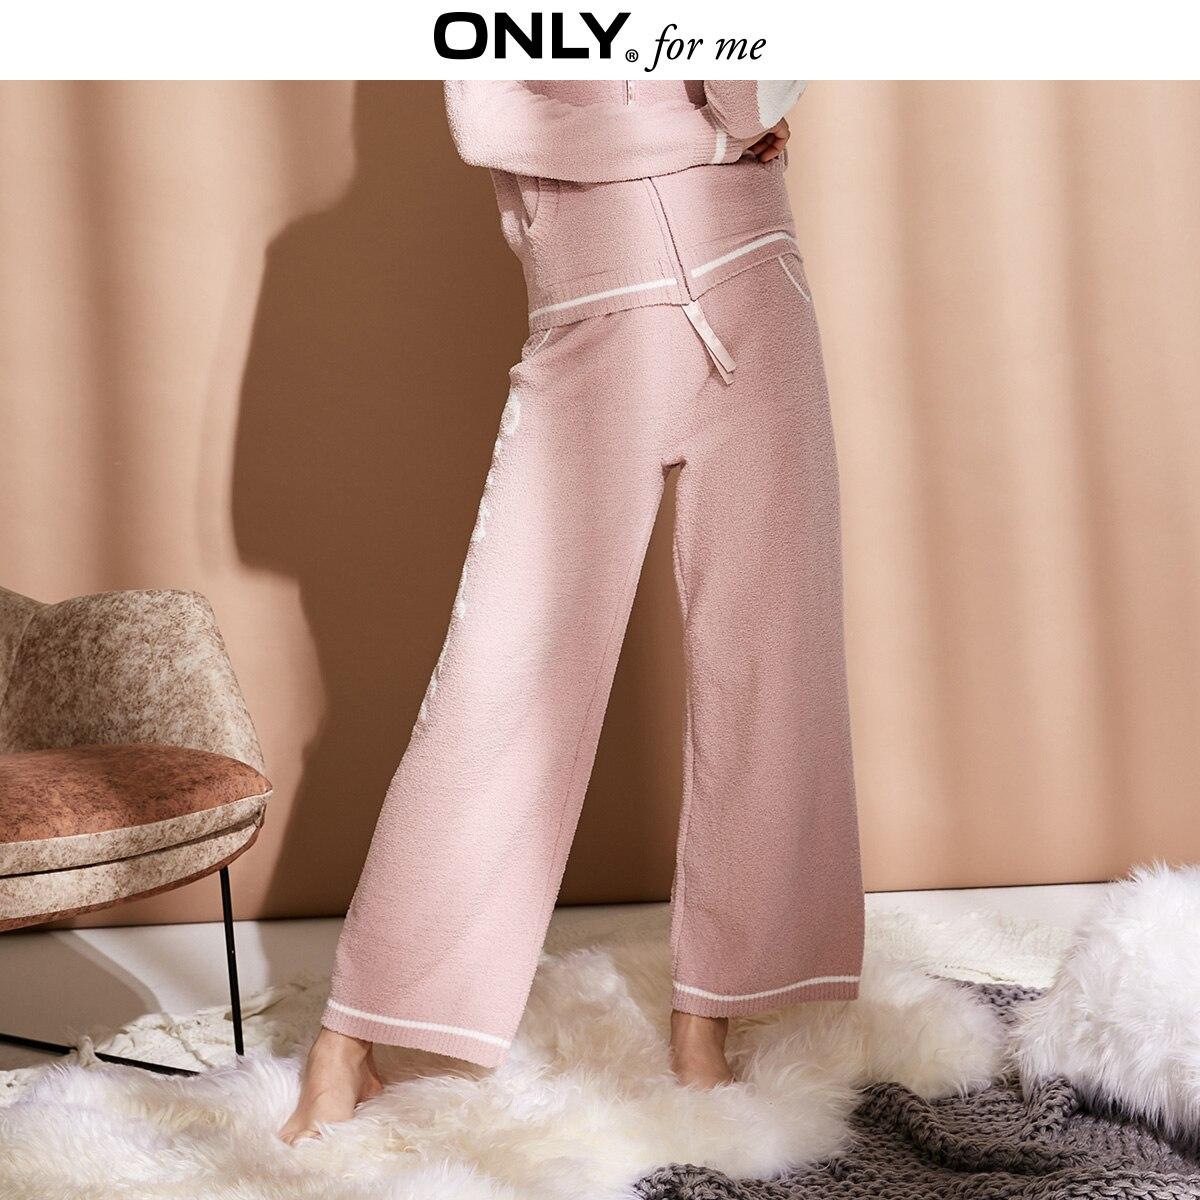 ONLY 2019 Spring Summer New Women's Letter Print Plush Casual Pants |11847V502